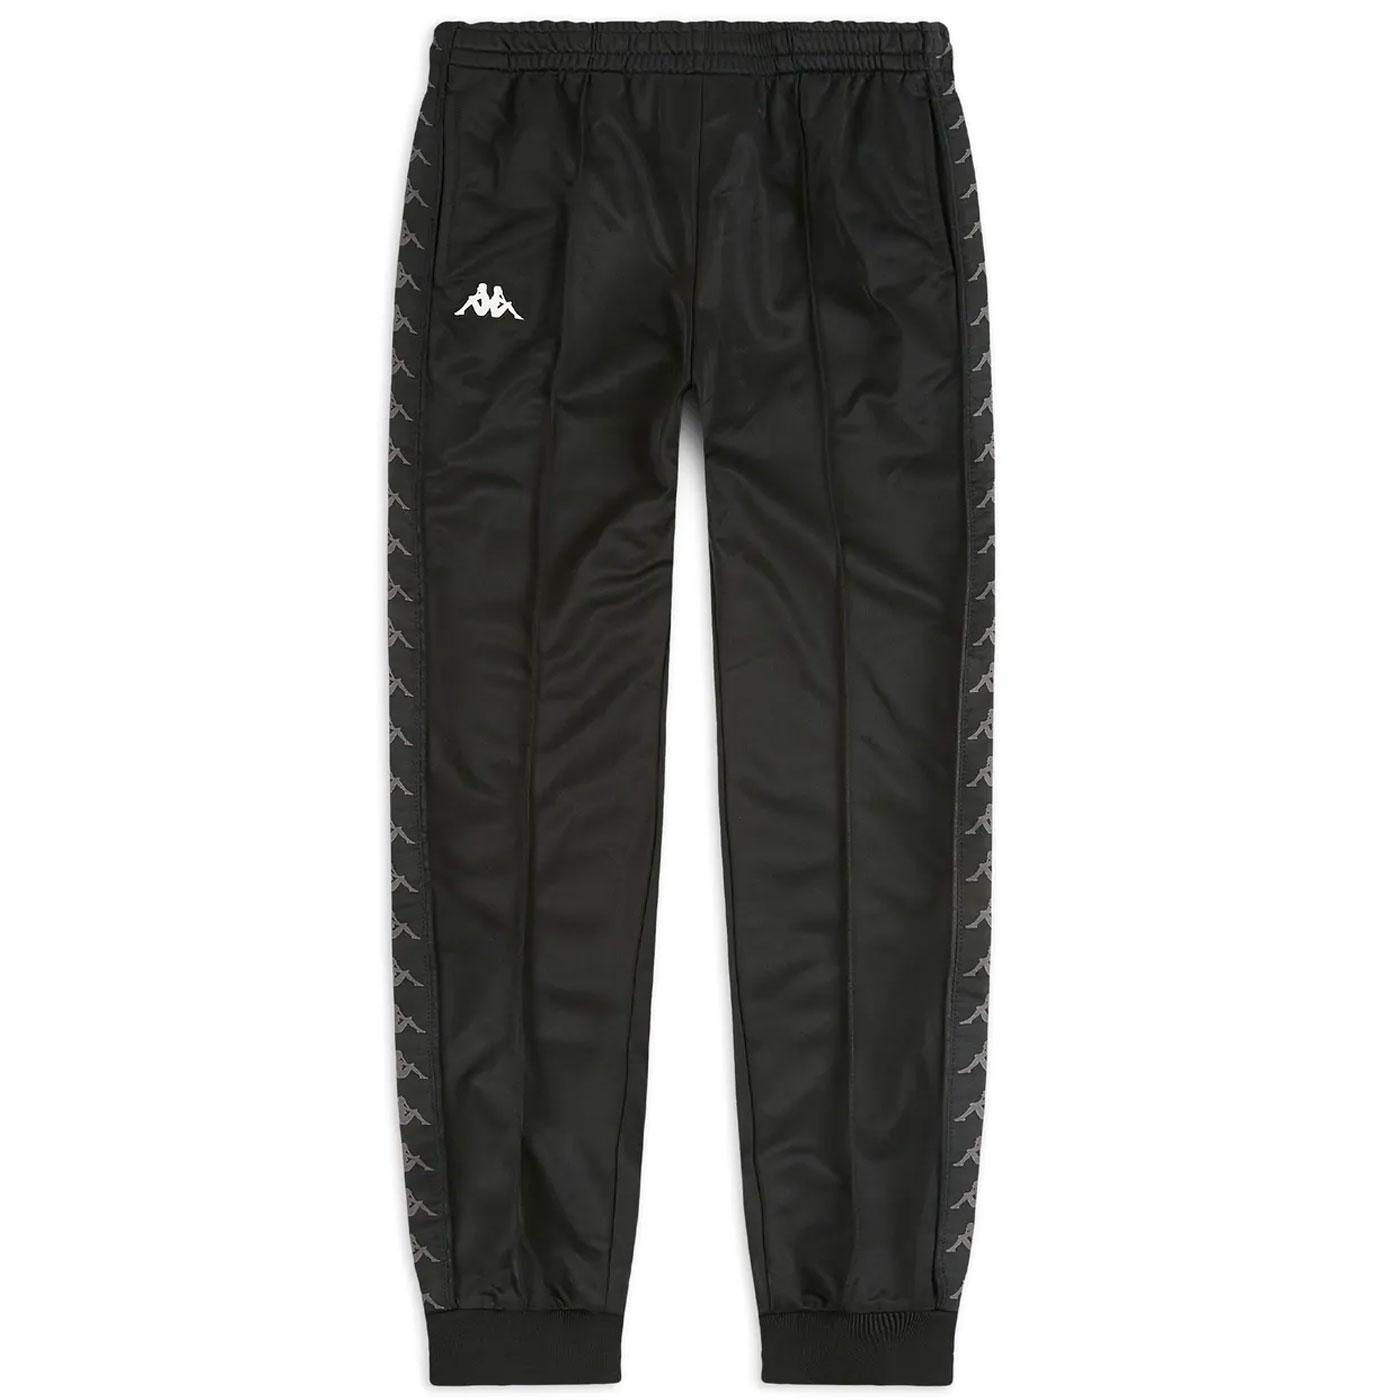 KAPPA Banda Rastoria 222 Track Pants (Black/White)